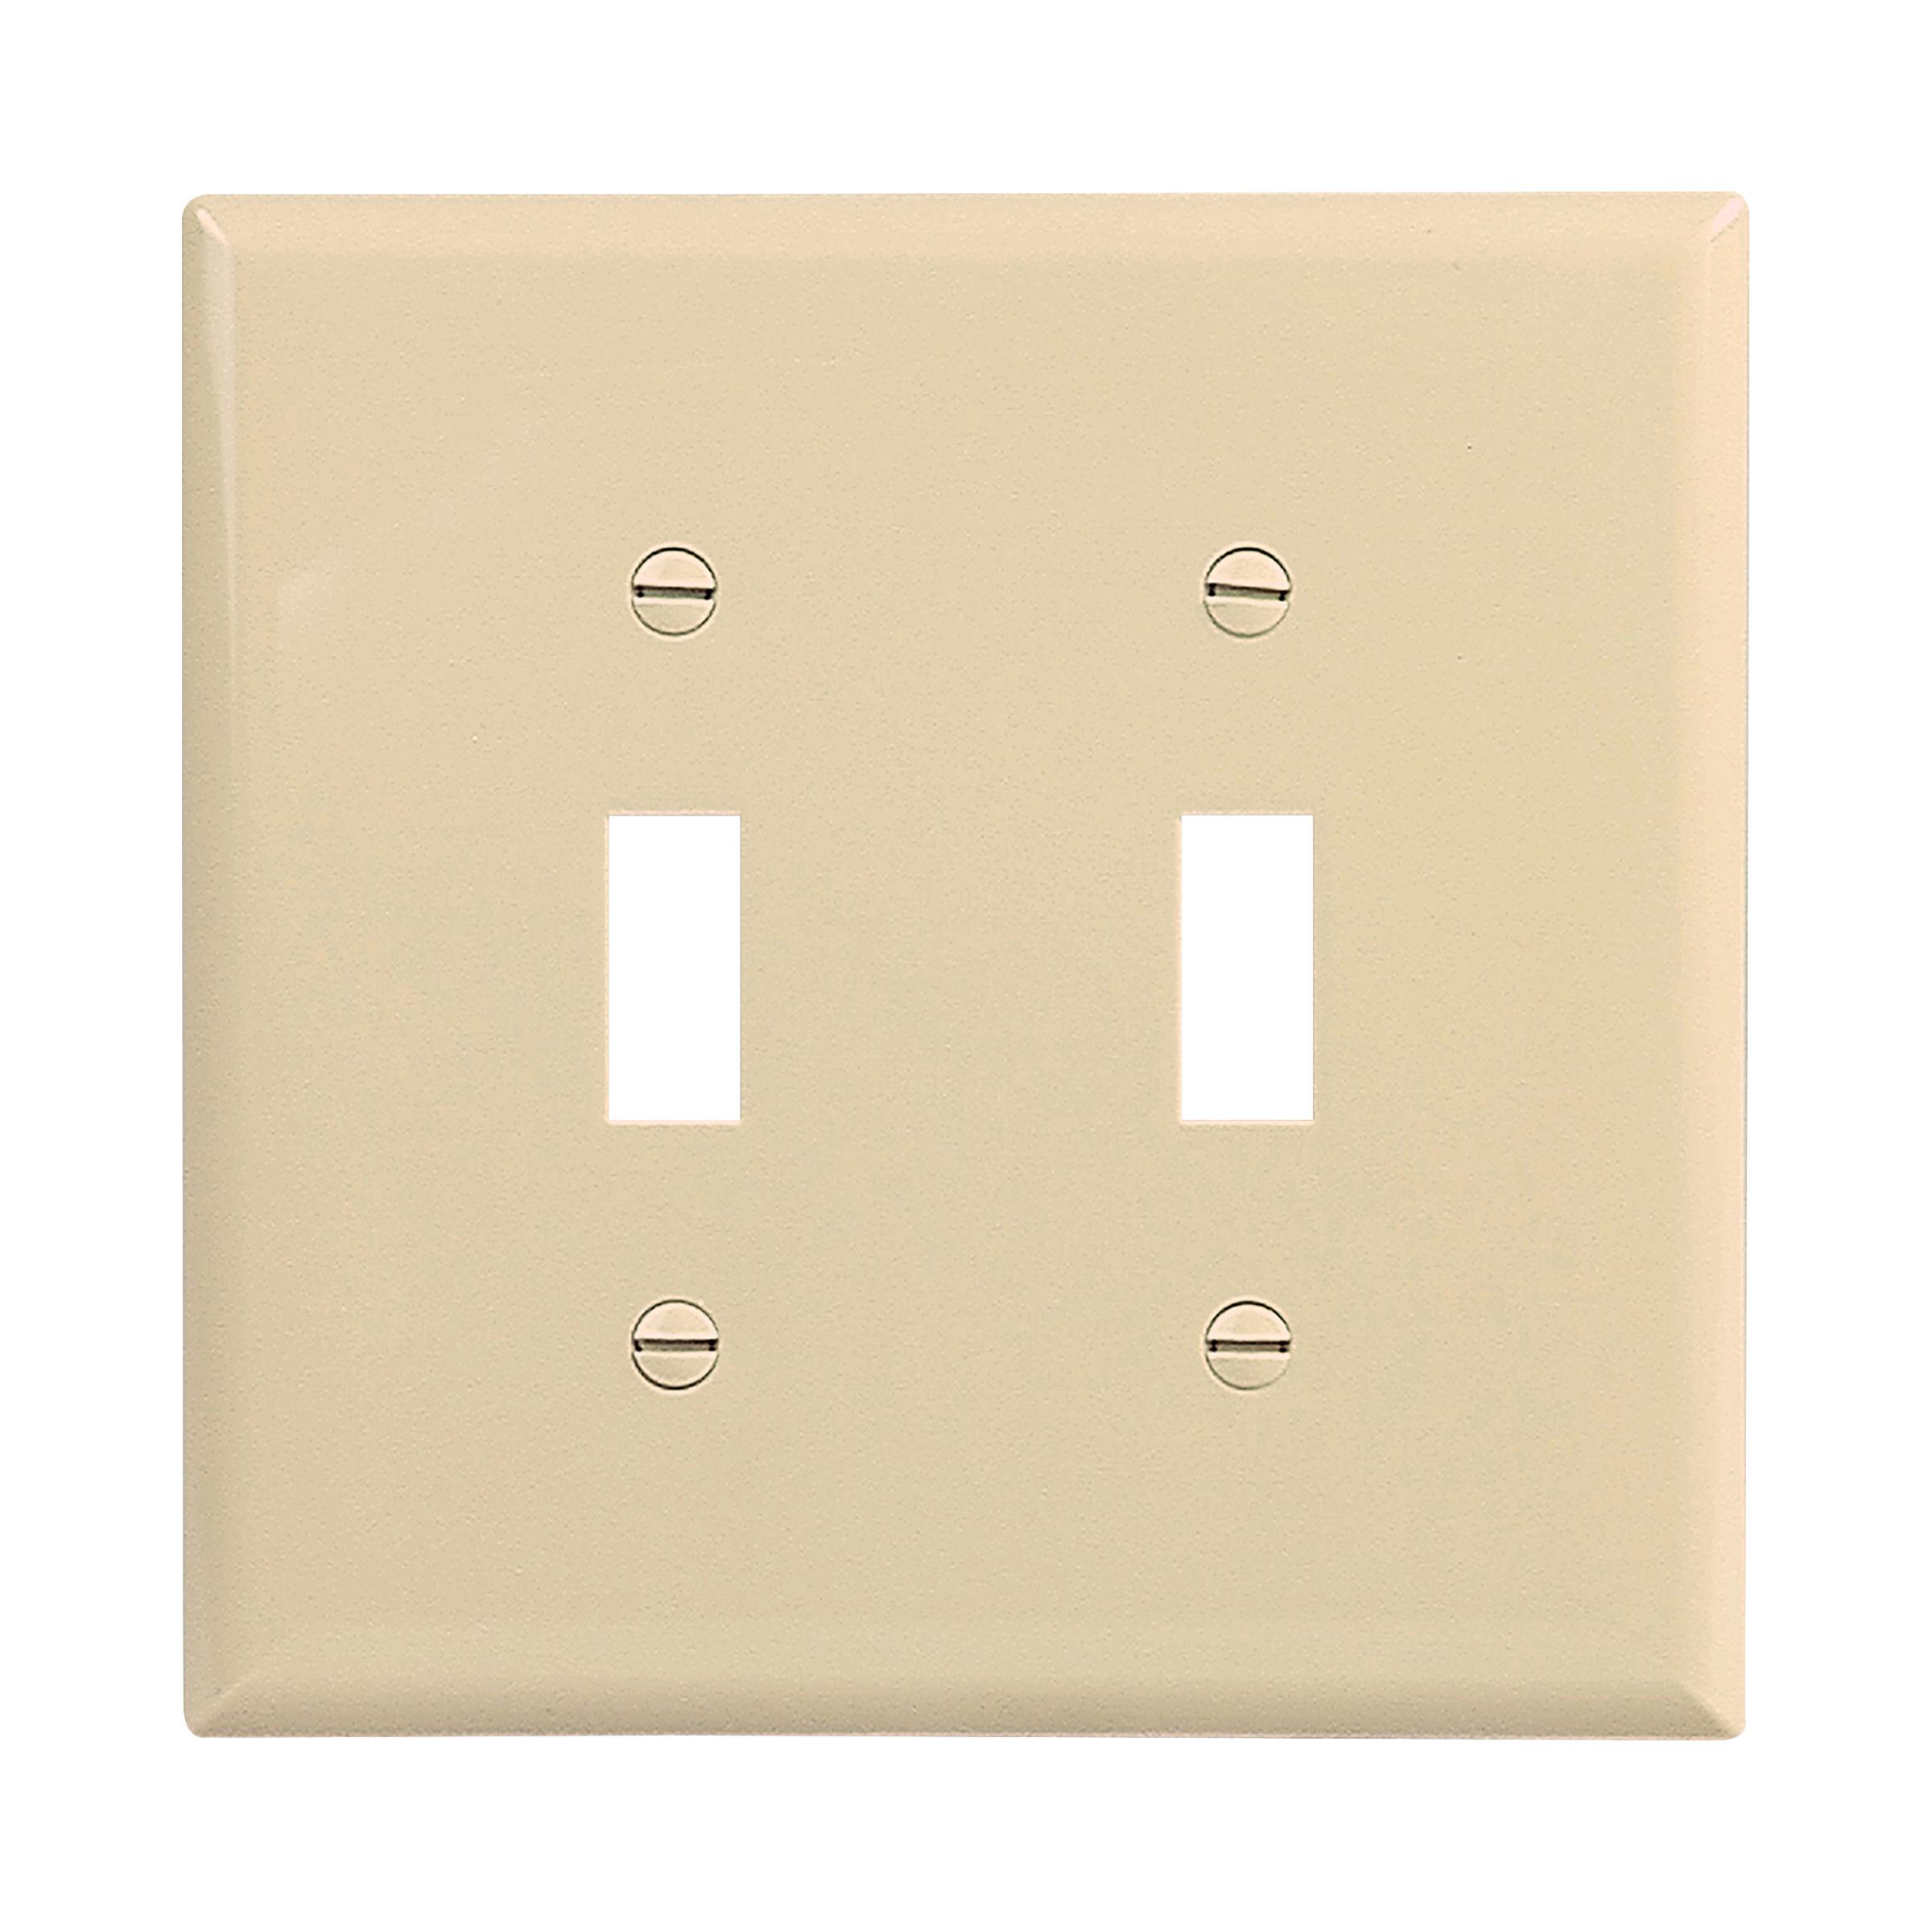 Mid-size Toggle Switch Wallplate (EAT PJ2V 2G NYLON MIDSIZE SWITCH)